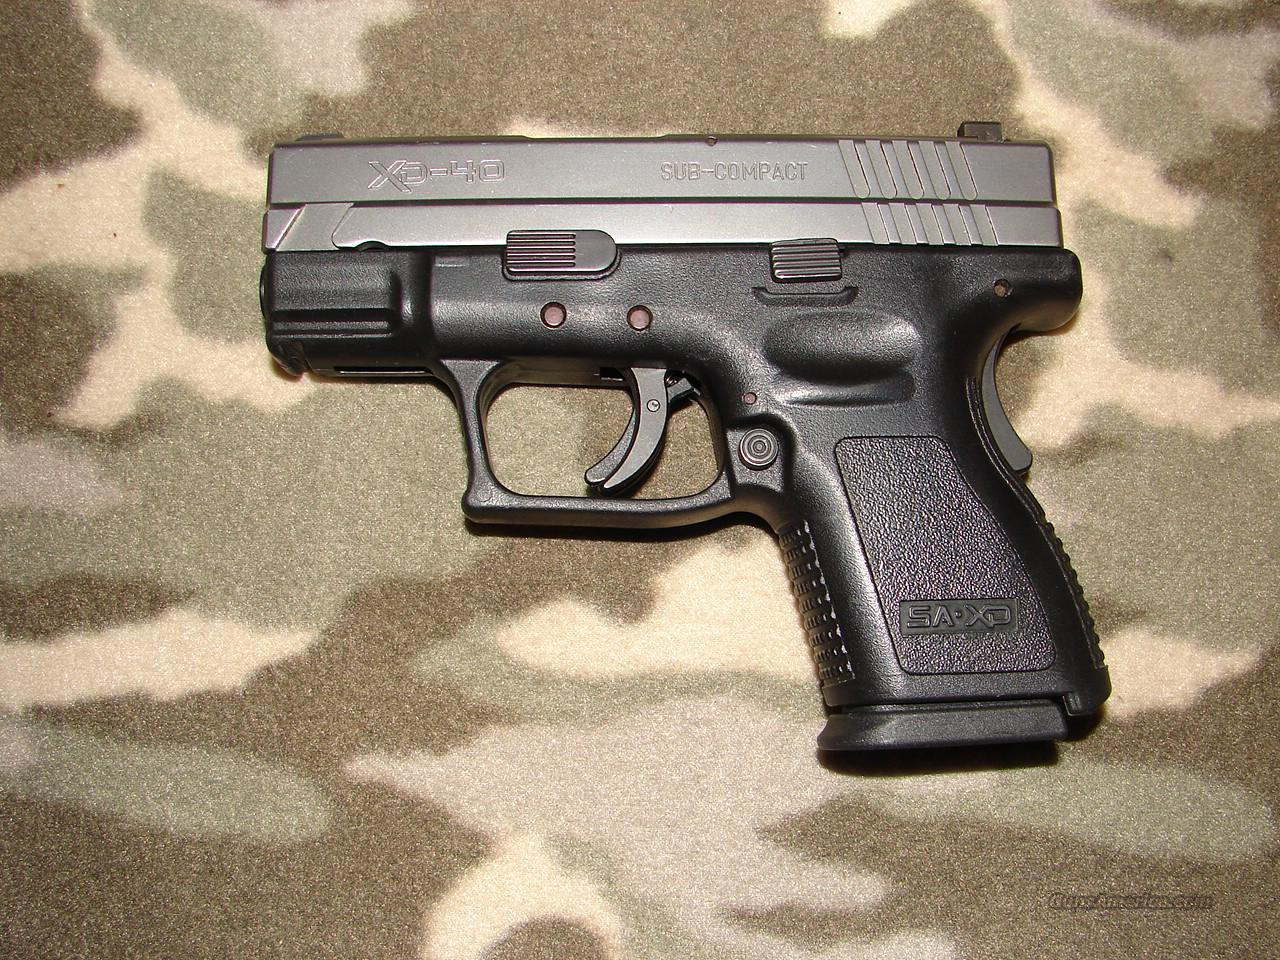 Springfield Armory XD Sub-Compact  Guns > Pistols > Springfield Armory Pistols > XD (eXtreme Duty)